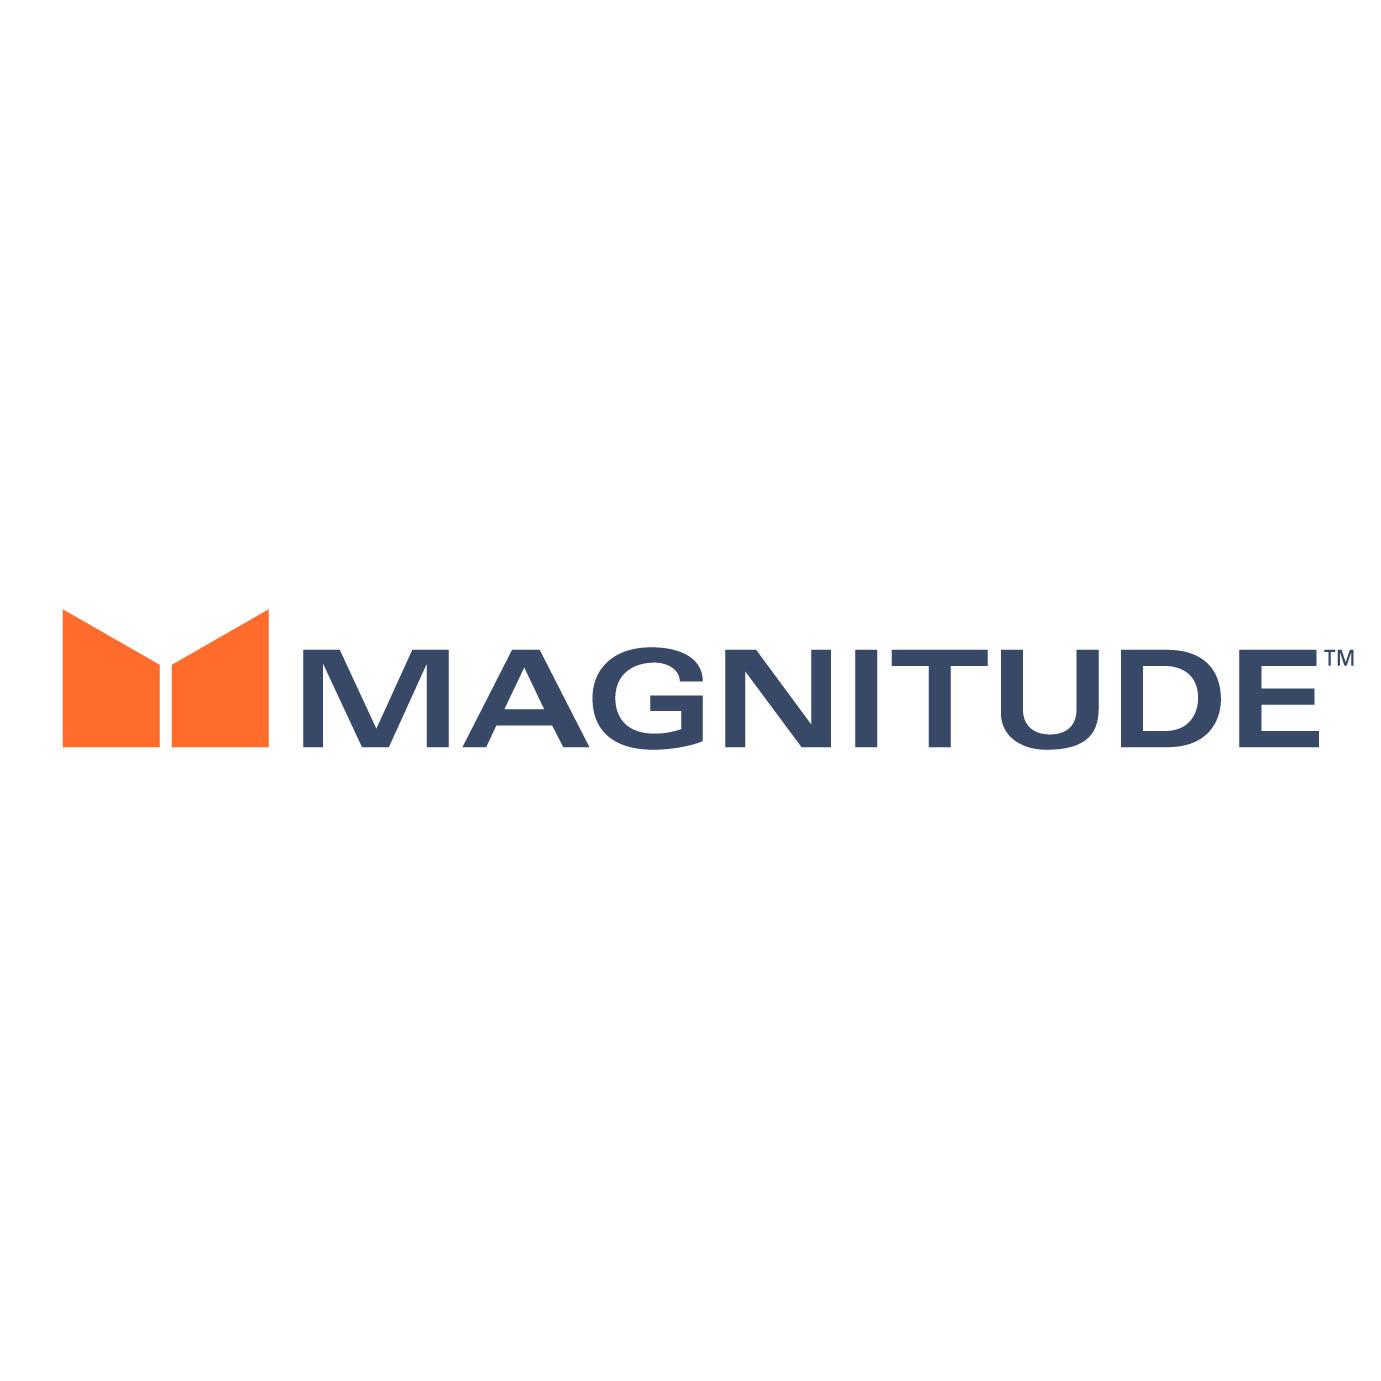 Magnitude_250x250